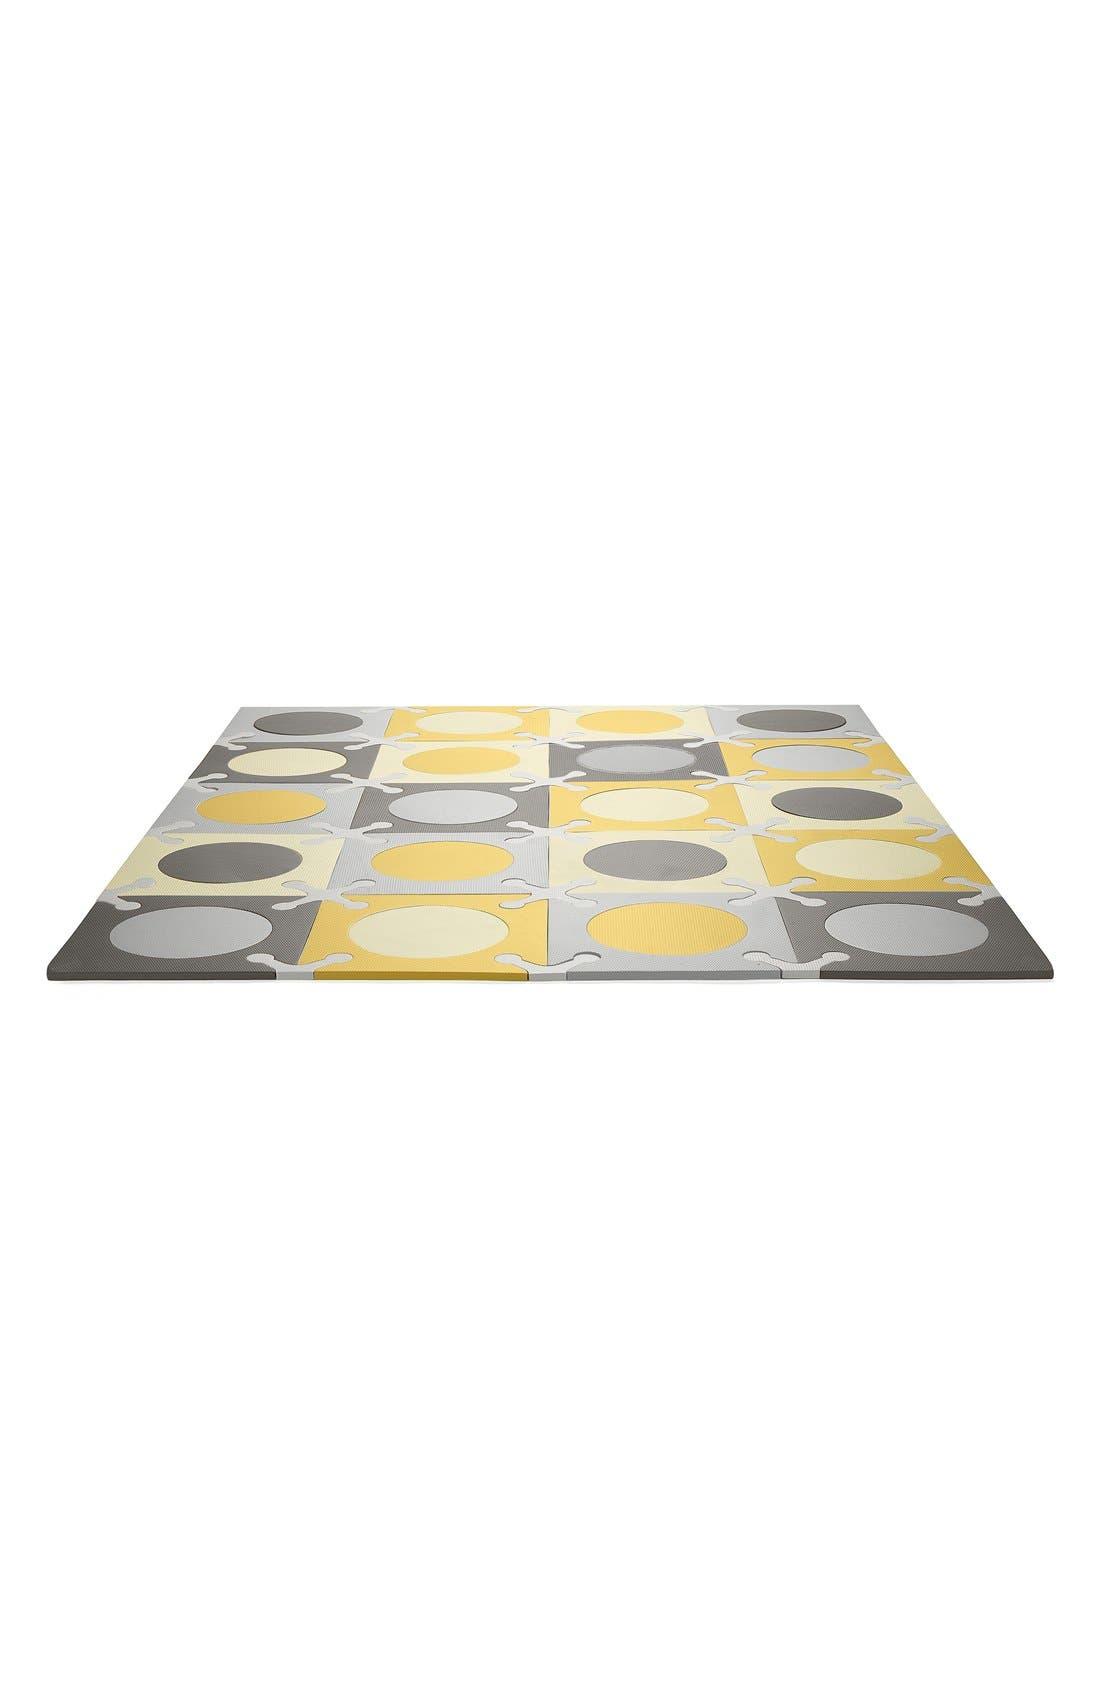 'Playspot' Floor Tiles,                         Main,                         color, Gray/ Gold